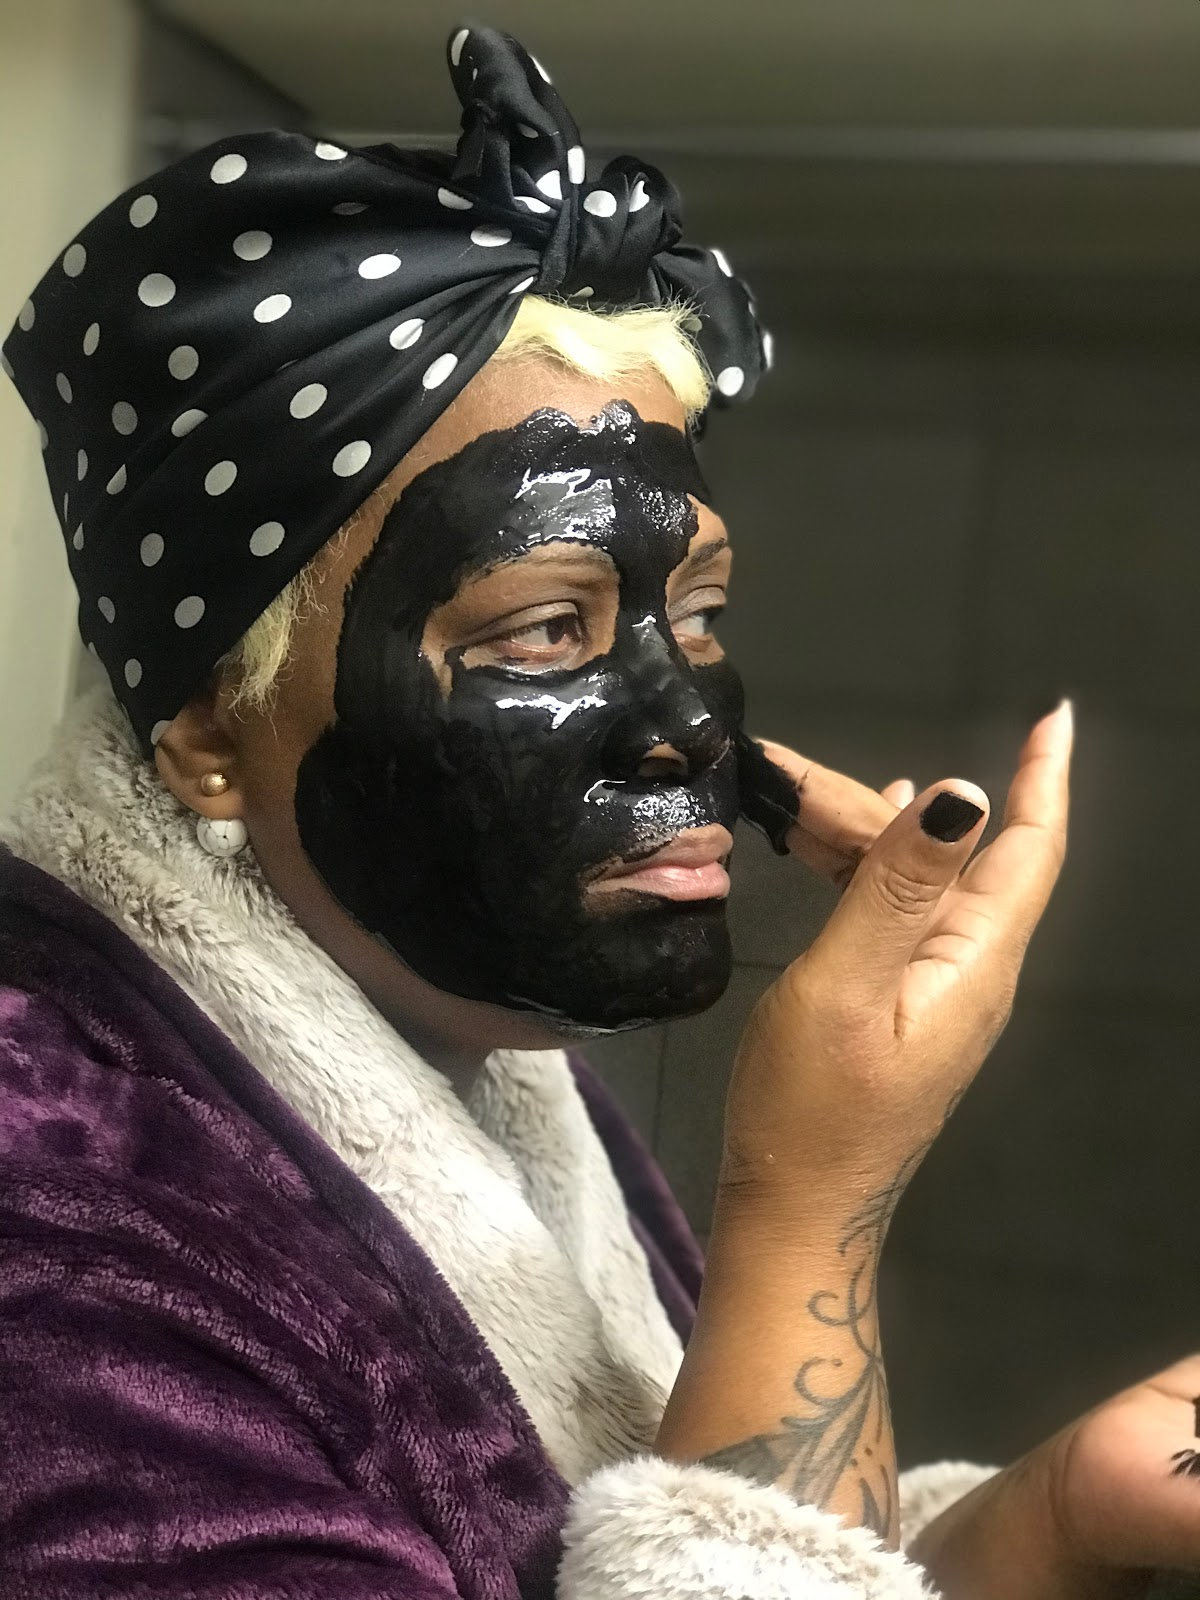 I Tried A New Face Mask! Tried a men's peel mask. Feel good beauty bits